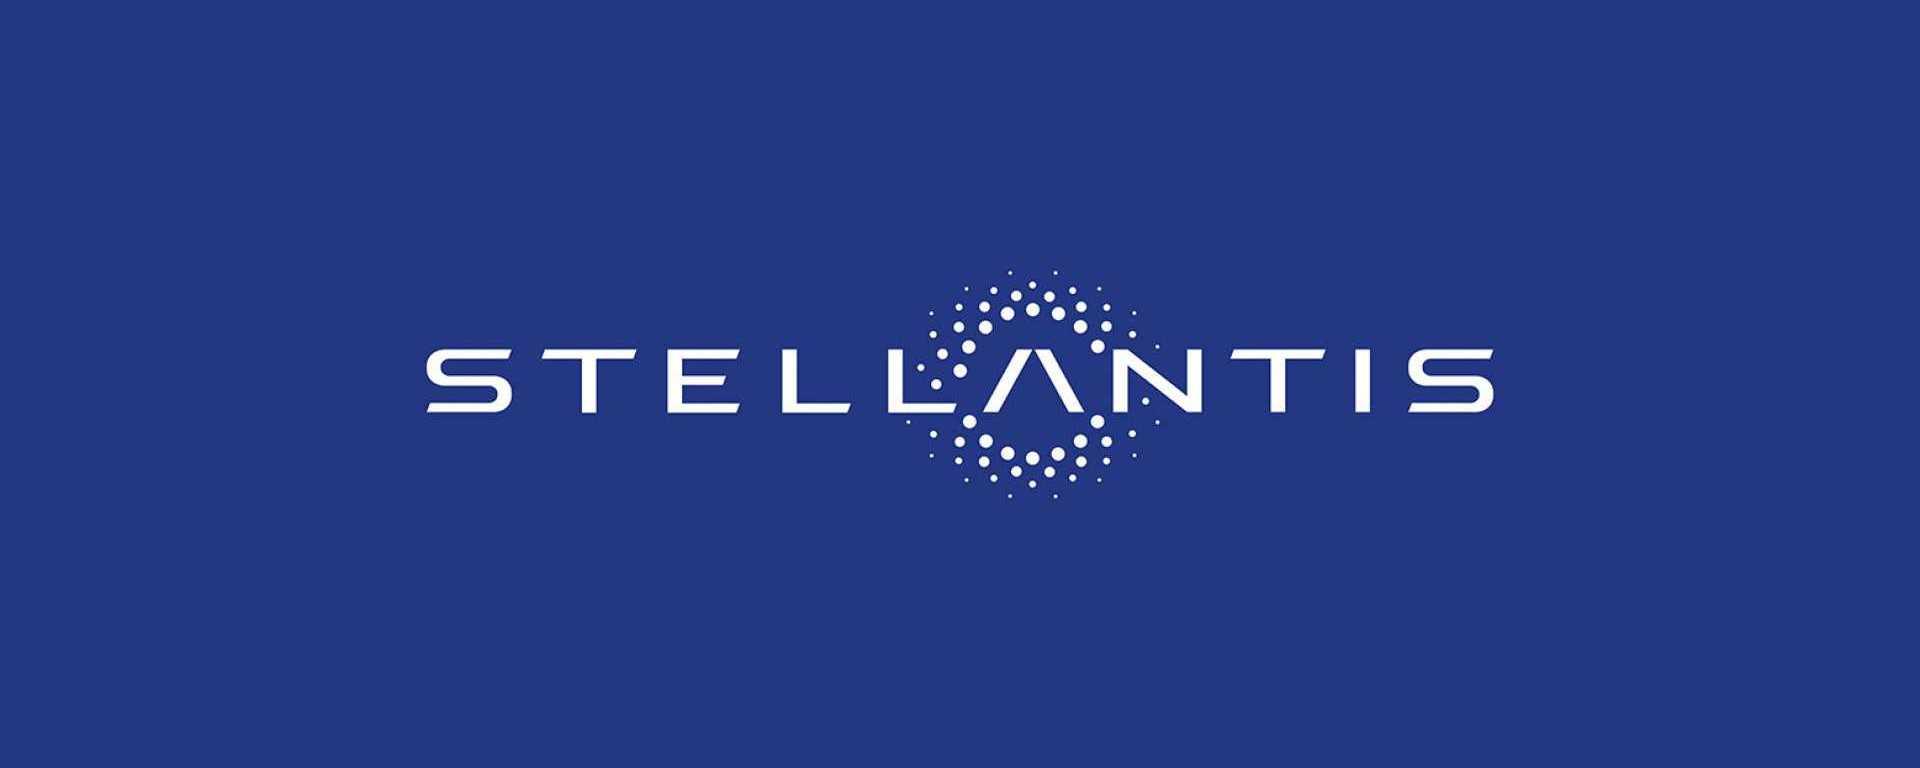 Stellantis Net Worth